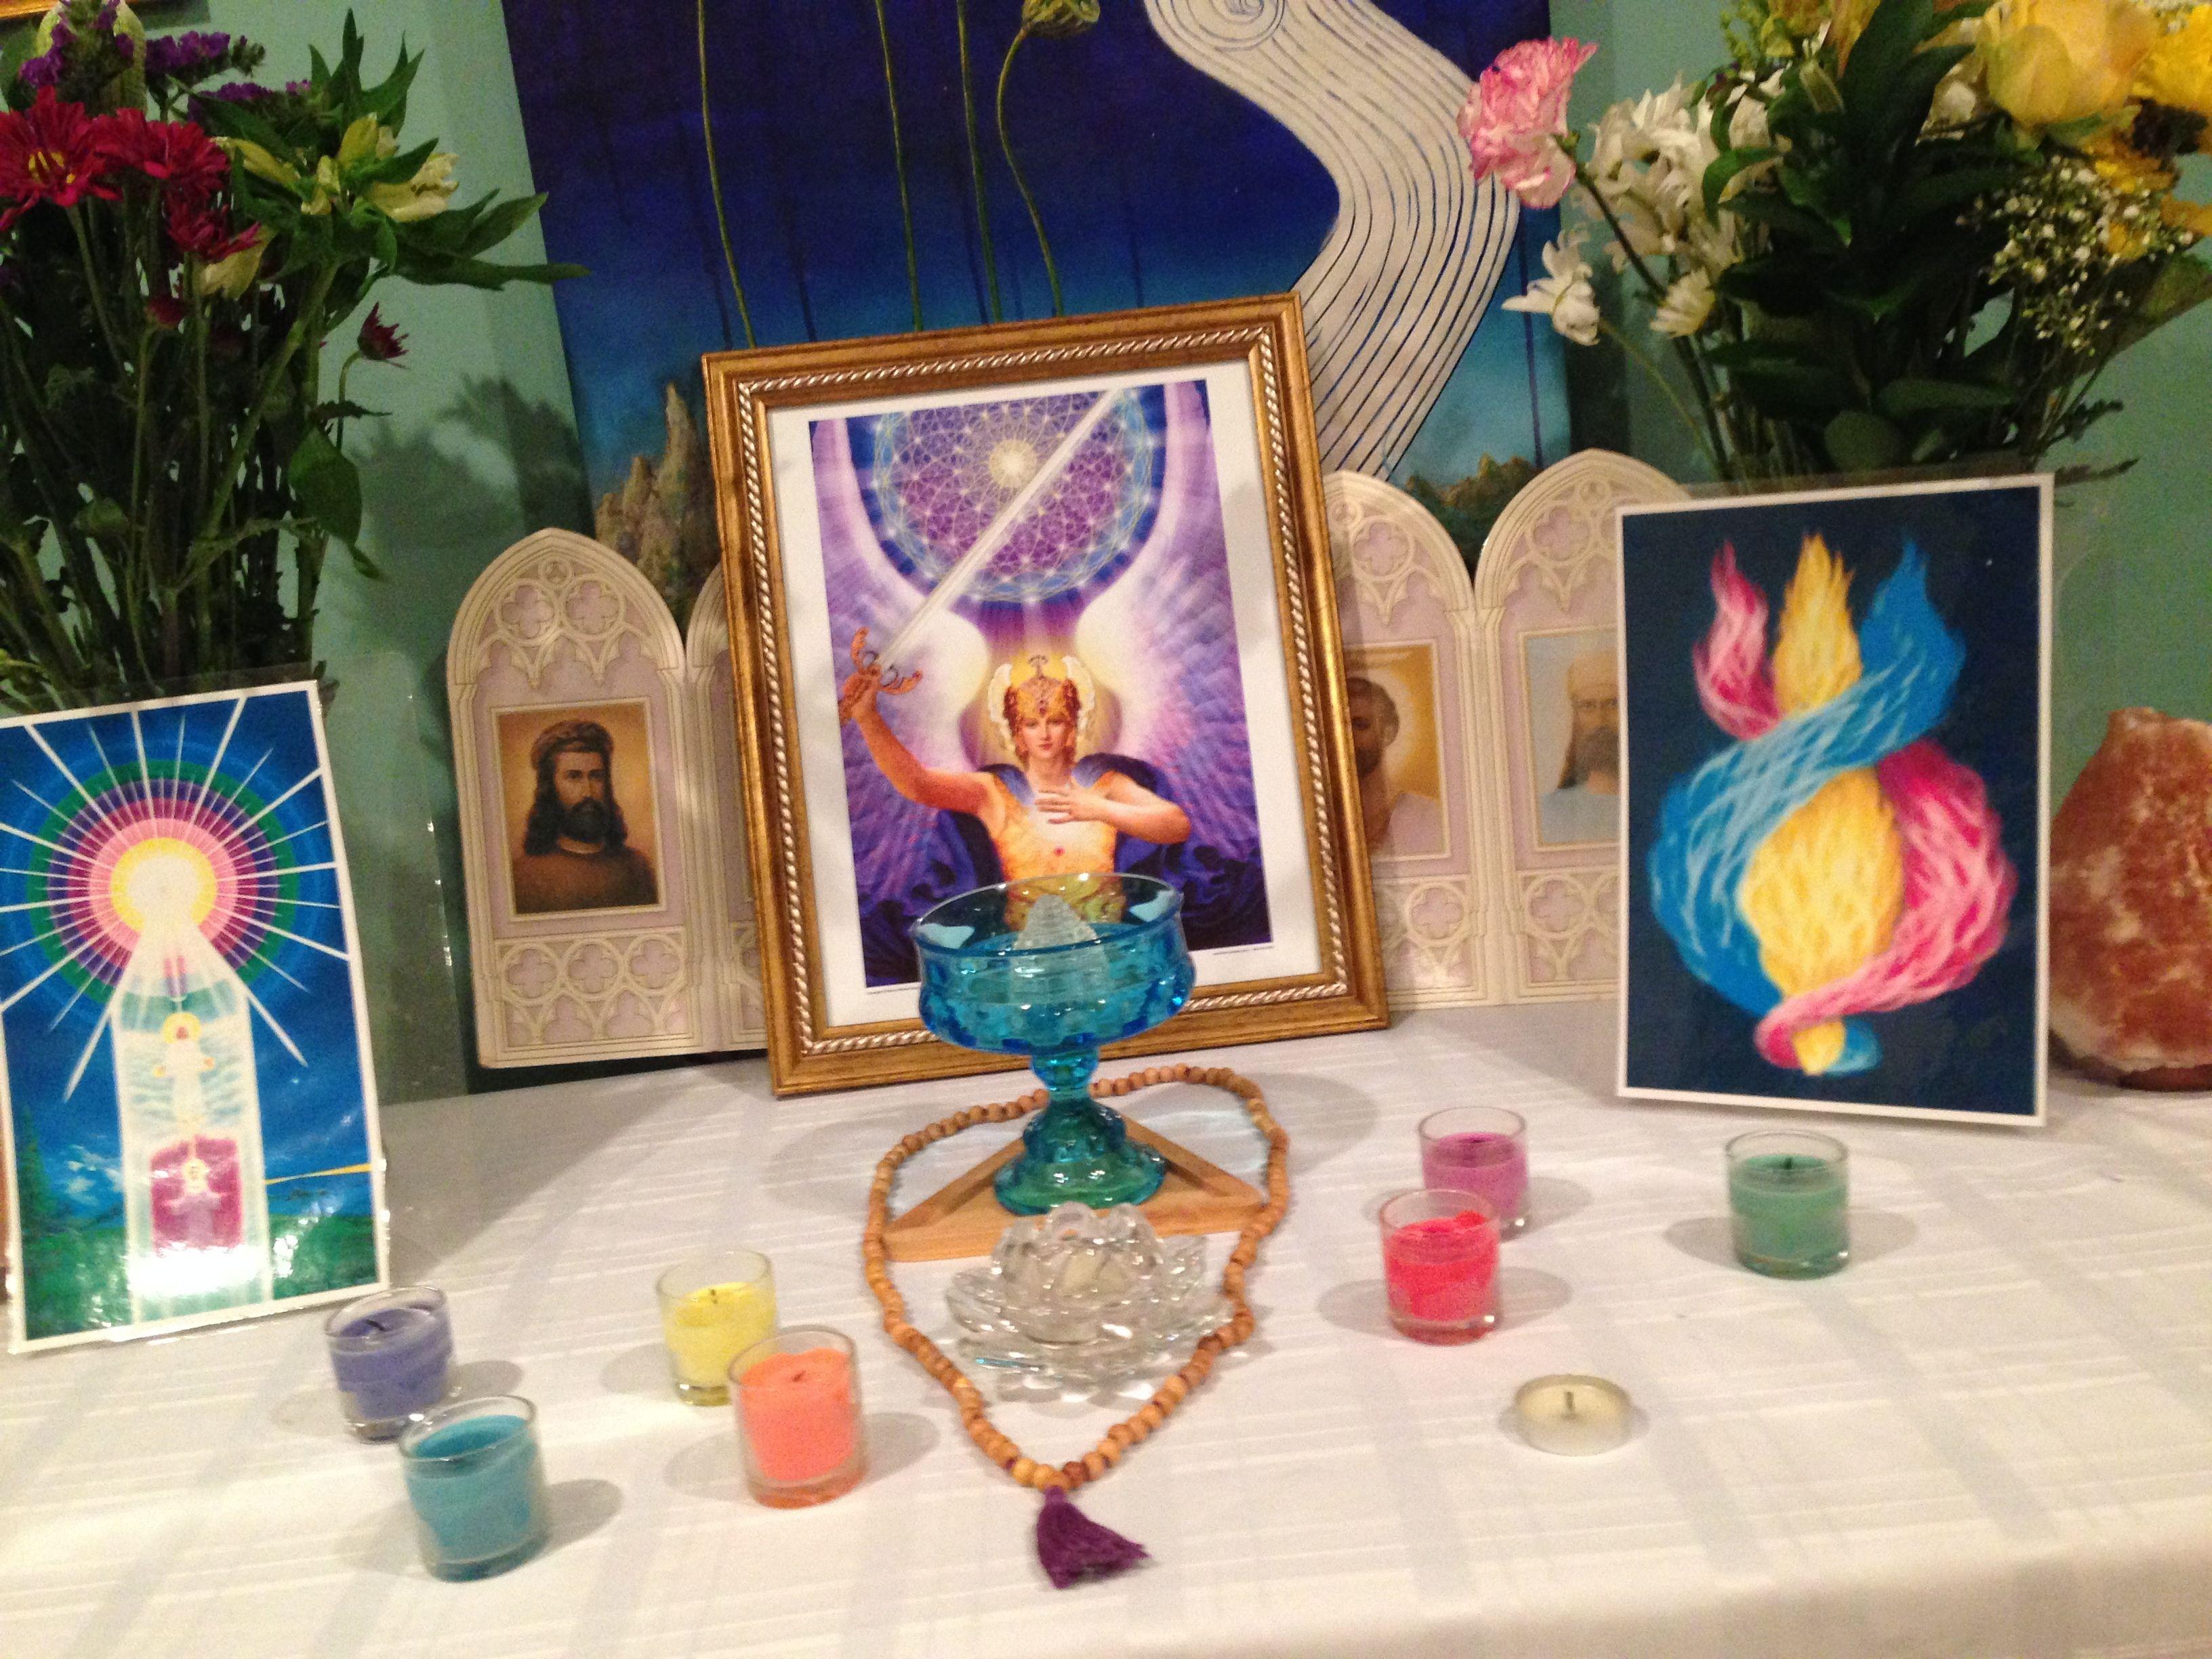 Being One Center: For Spiritual Studies & Universal Healing